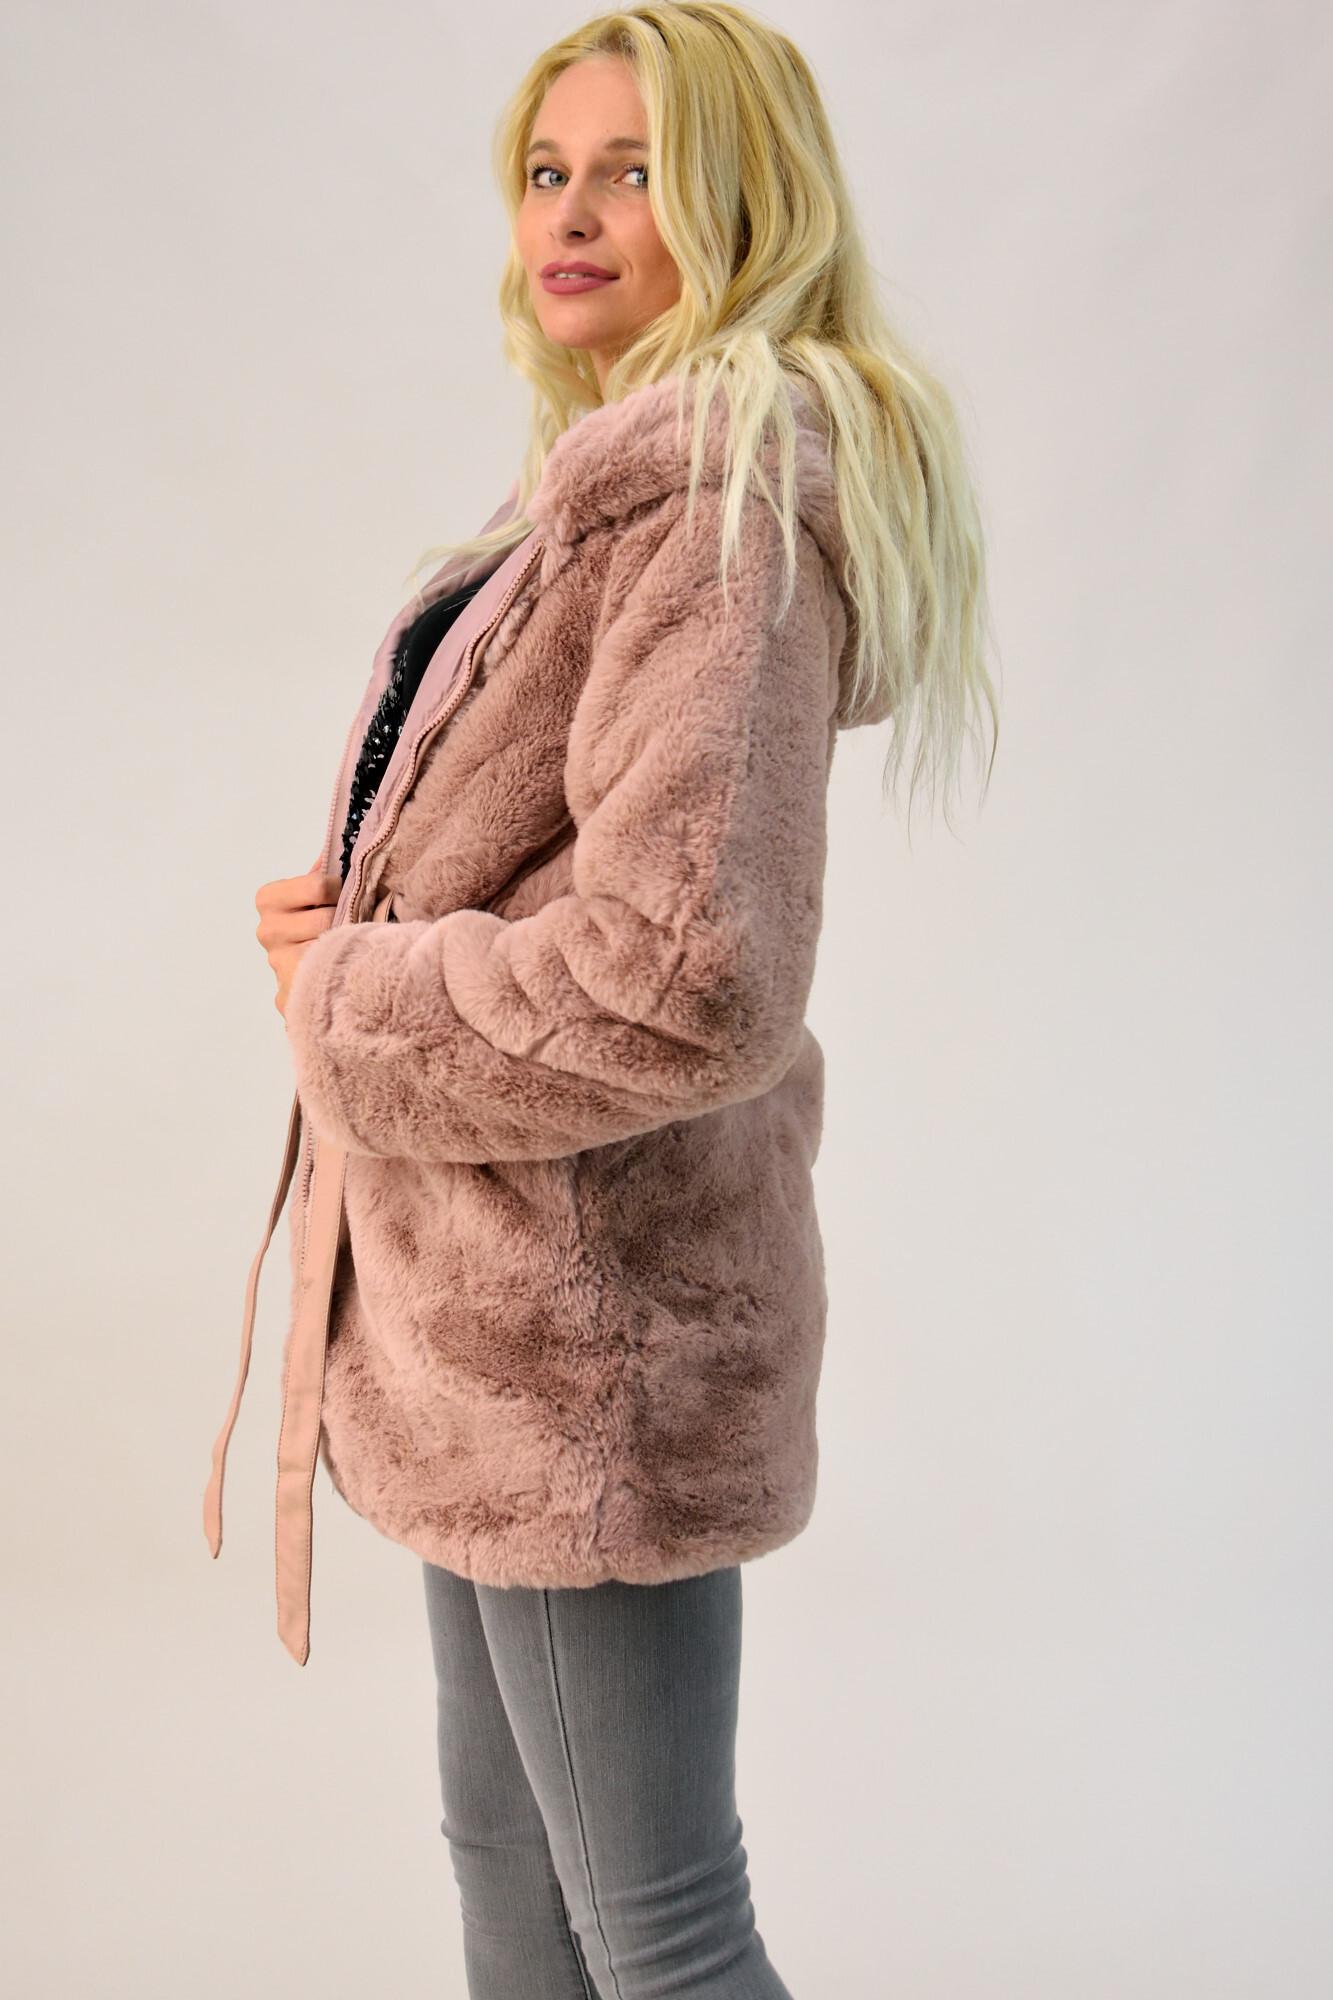 65450158ce06 Παλτό από συνθετική γούνα με κουκούλα. Tap to expand